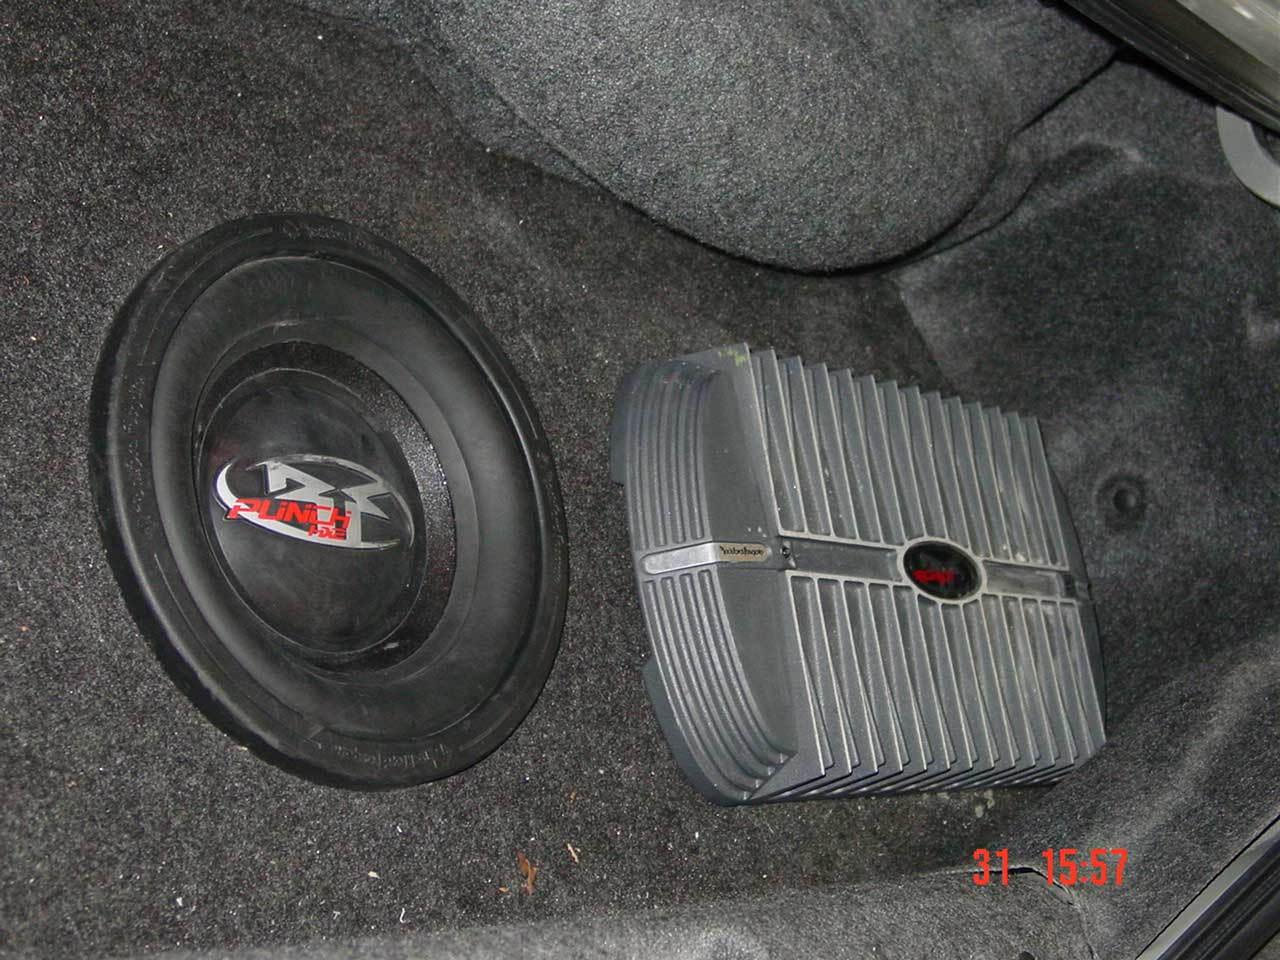 Fs Rockford Fosgate Amp Punch 10002 Watts S2ki Honda S2000 Forums Specs